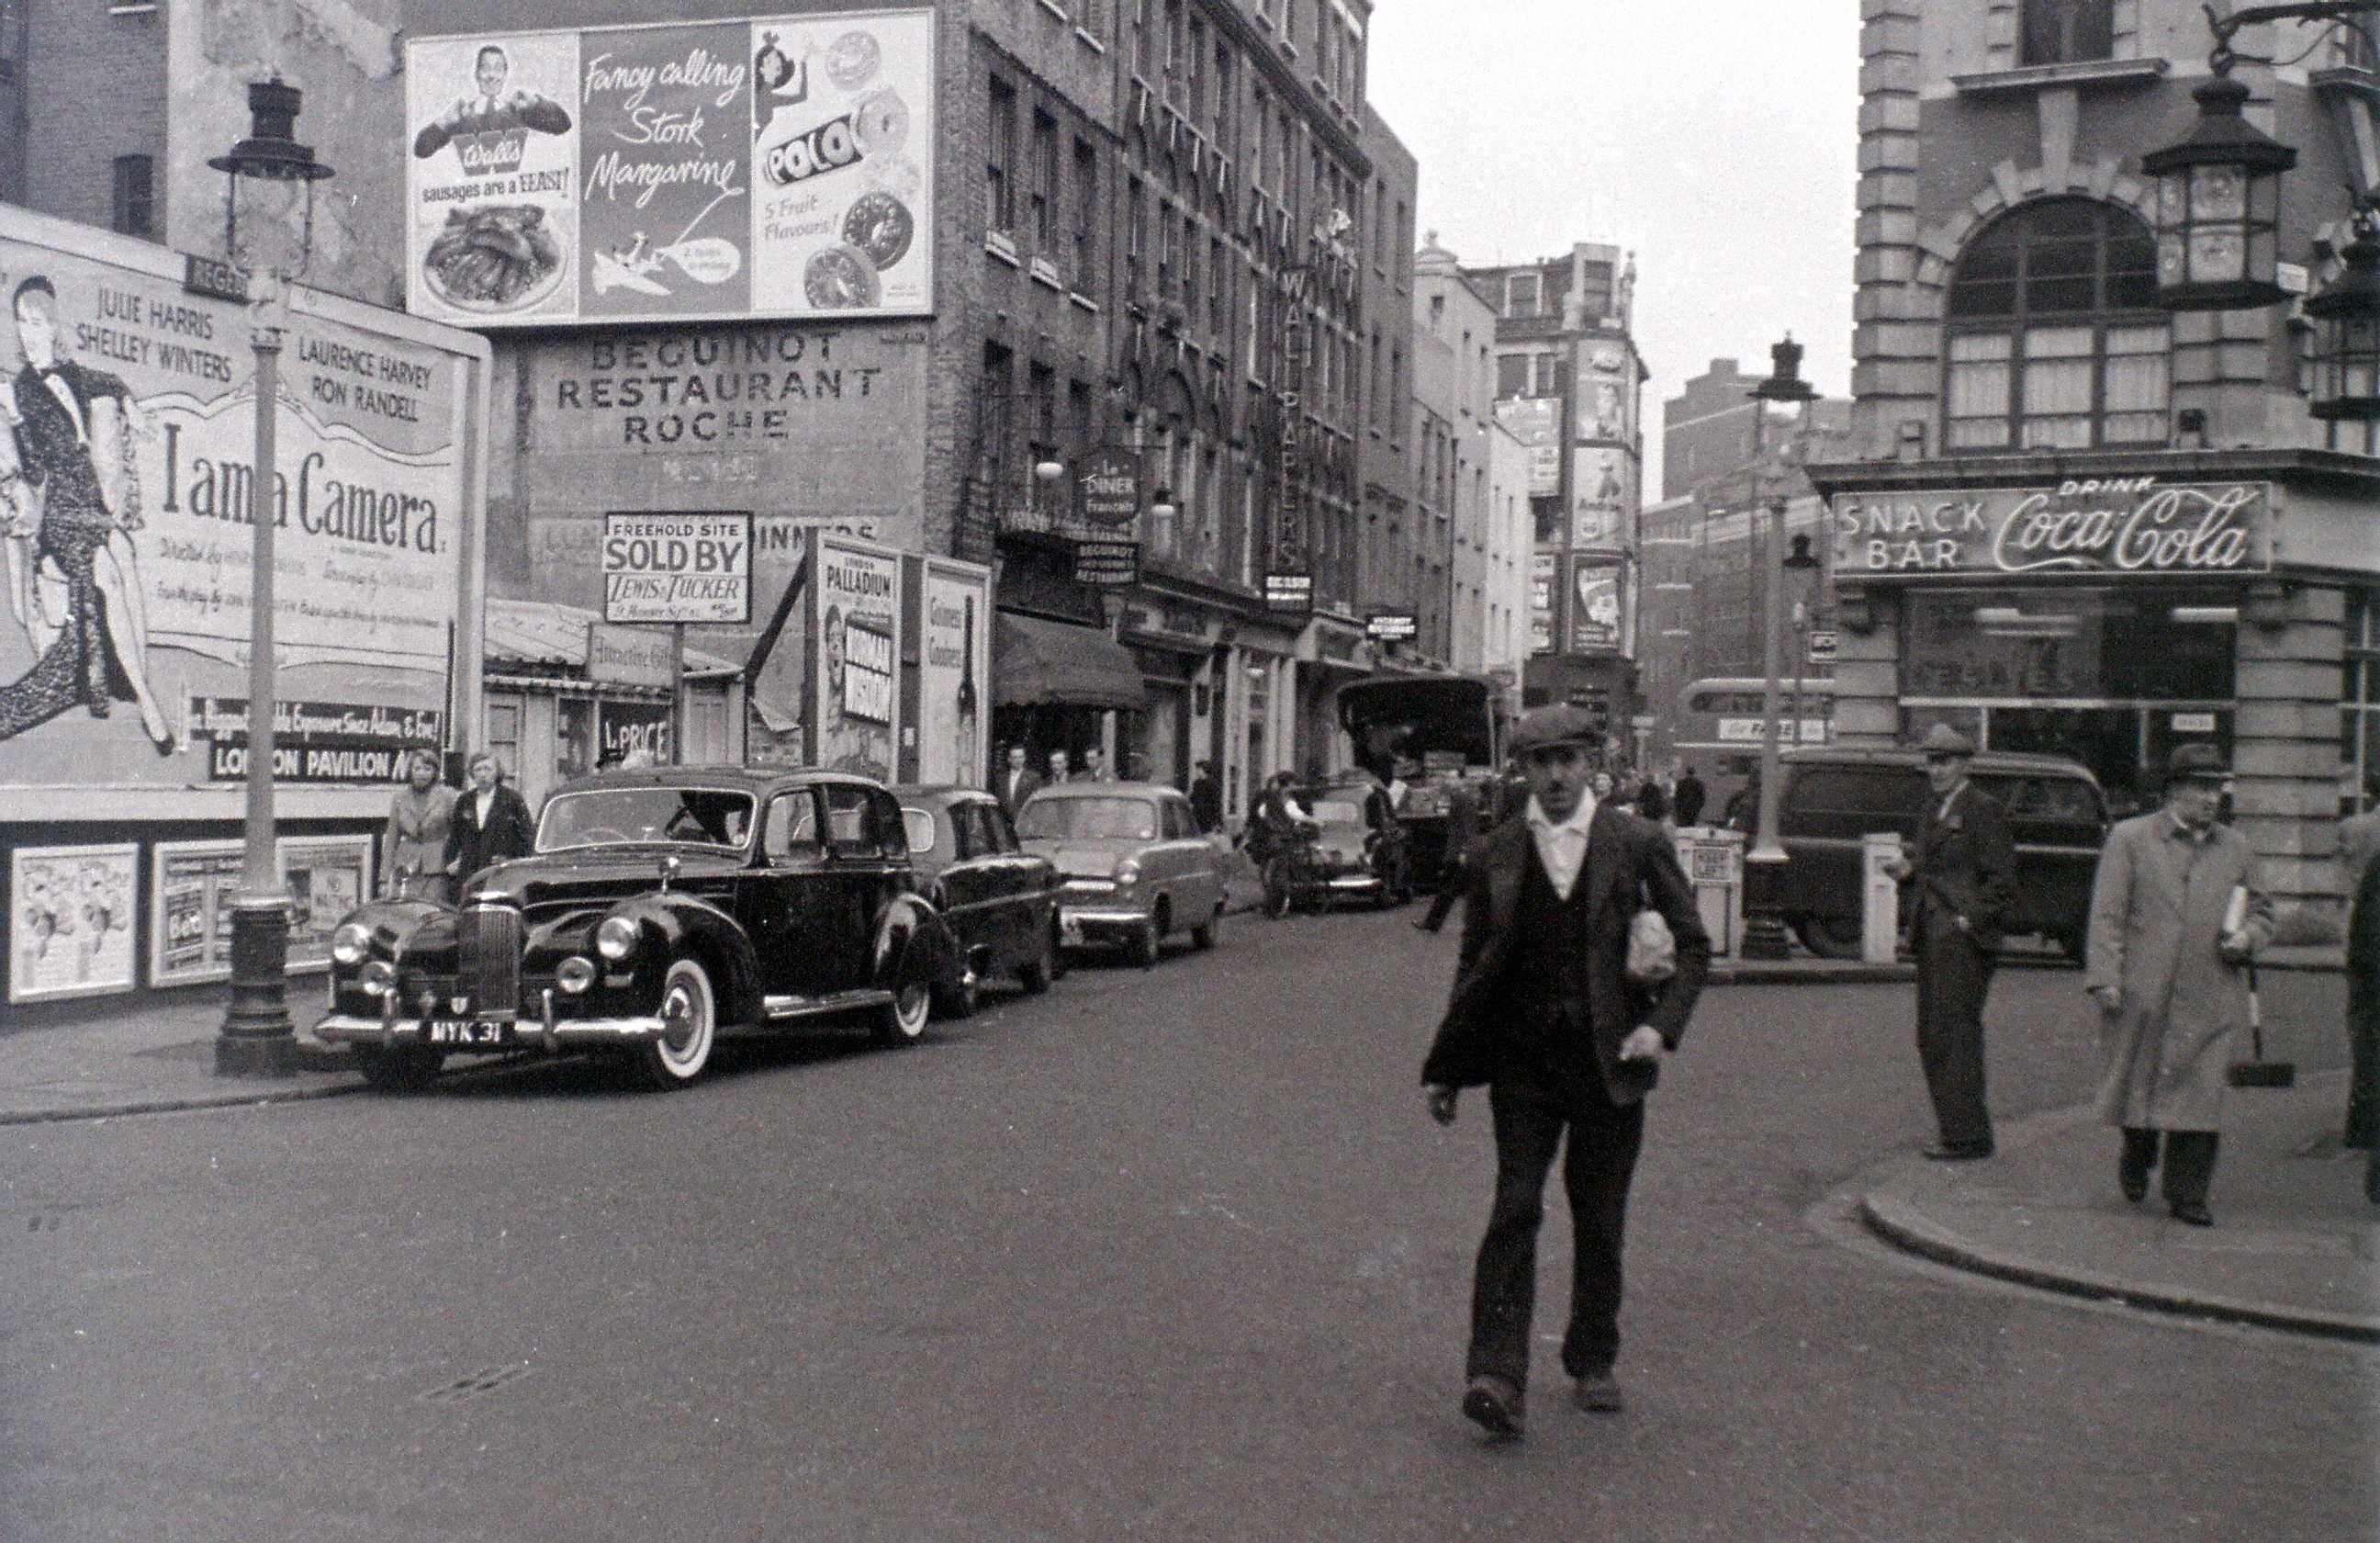 Soho London 5 November 1955 London Pictures London History London Life